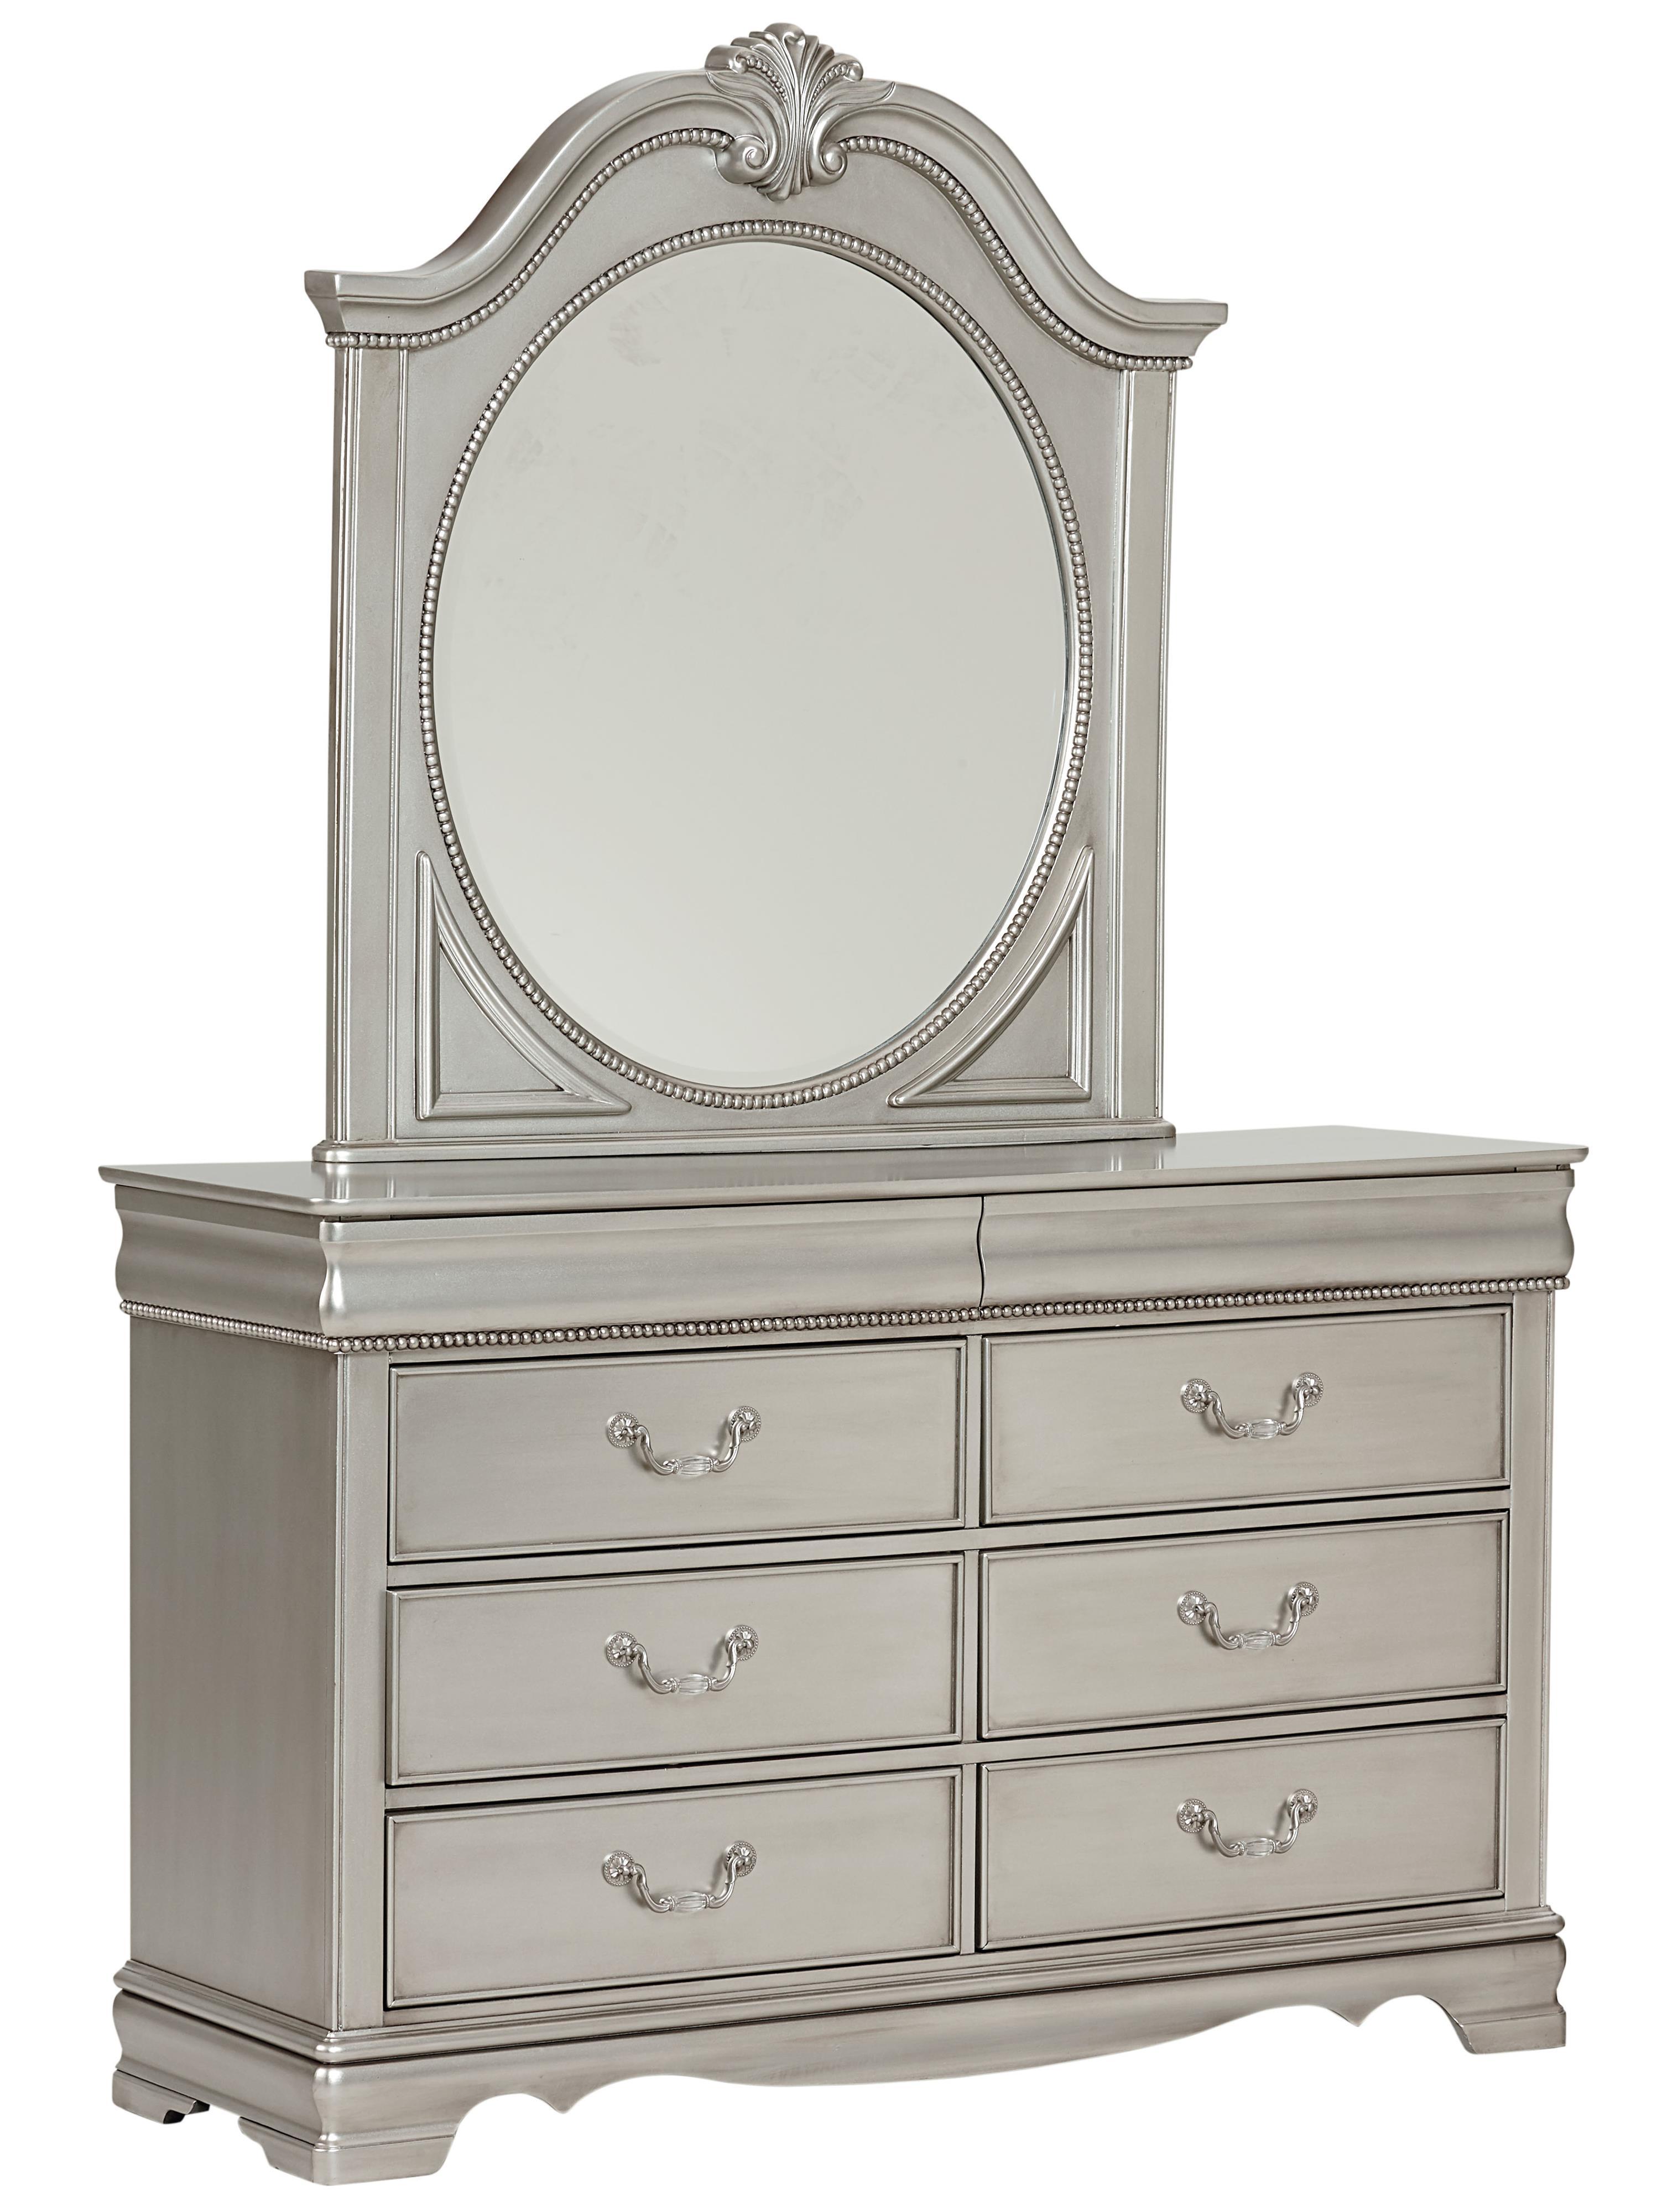 Standard Furniture Jessica Silver Dresser & Mirror - Item Number: 93558+9